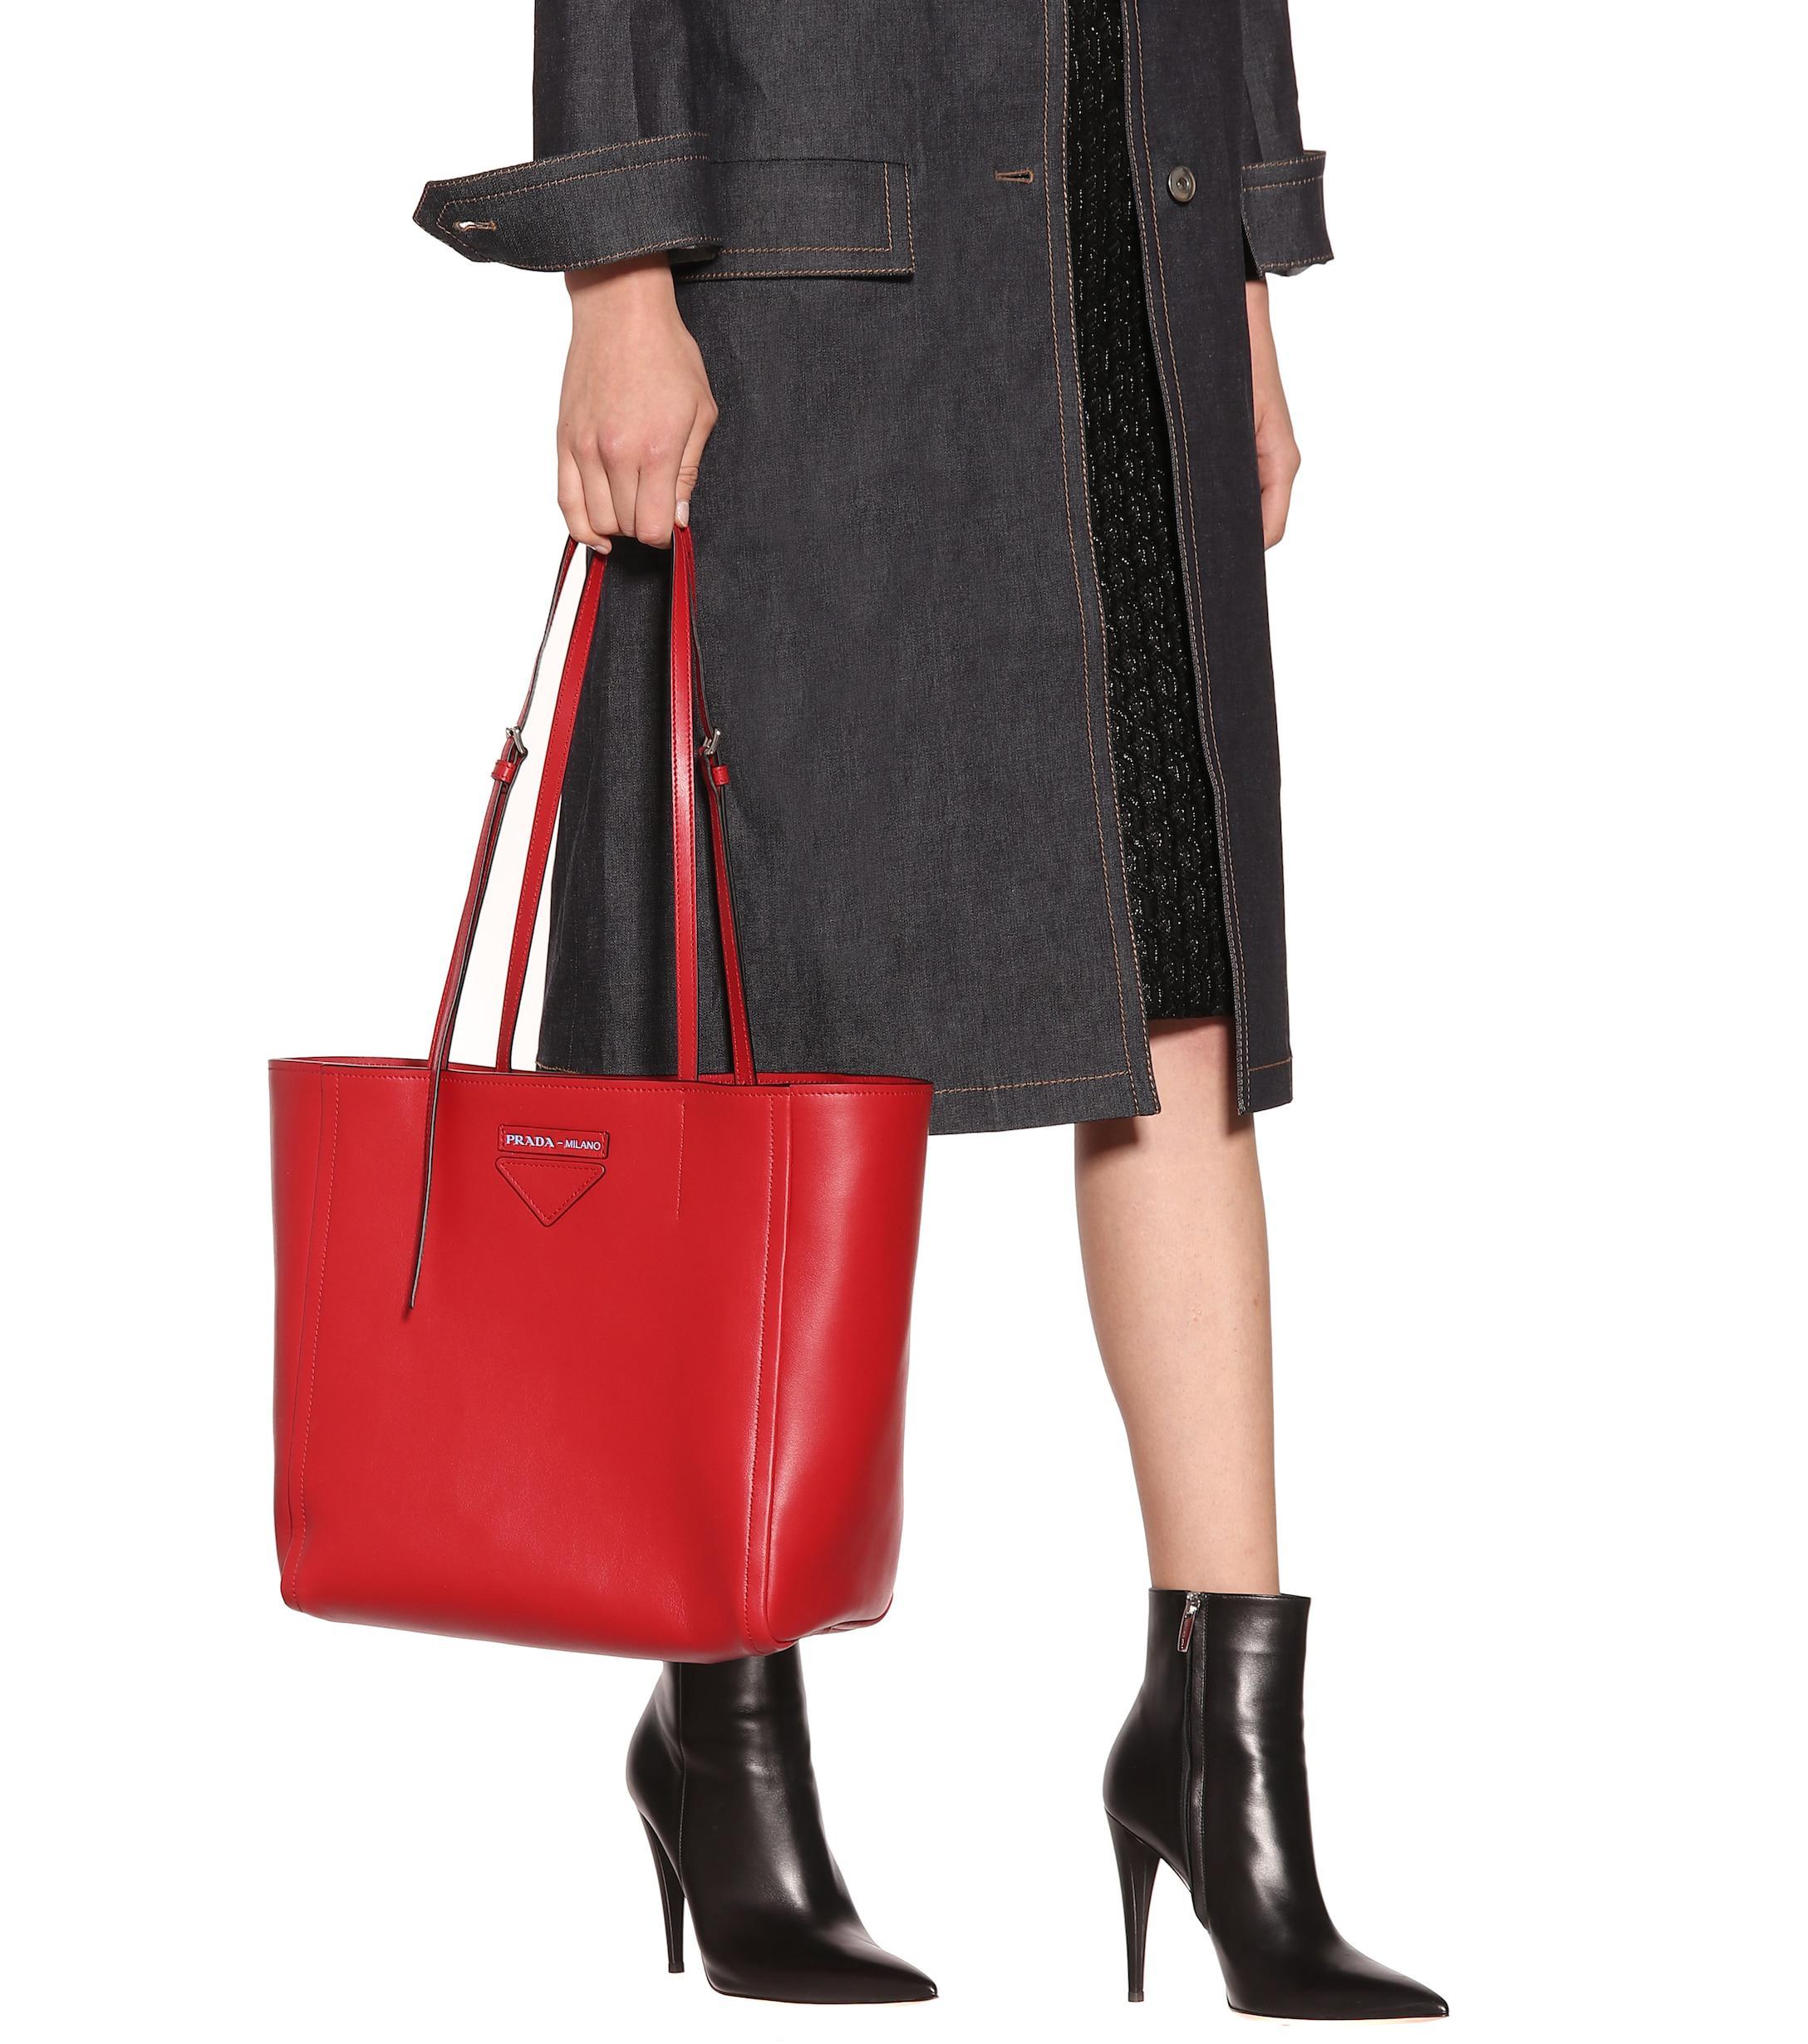 Lyst - Prada Concept Leather Tote in Red e82ff0a9ba1ac